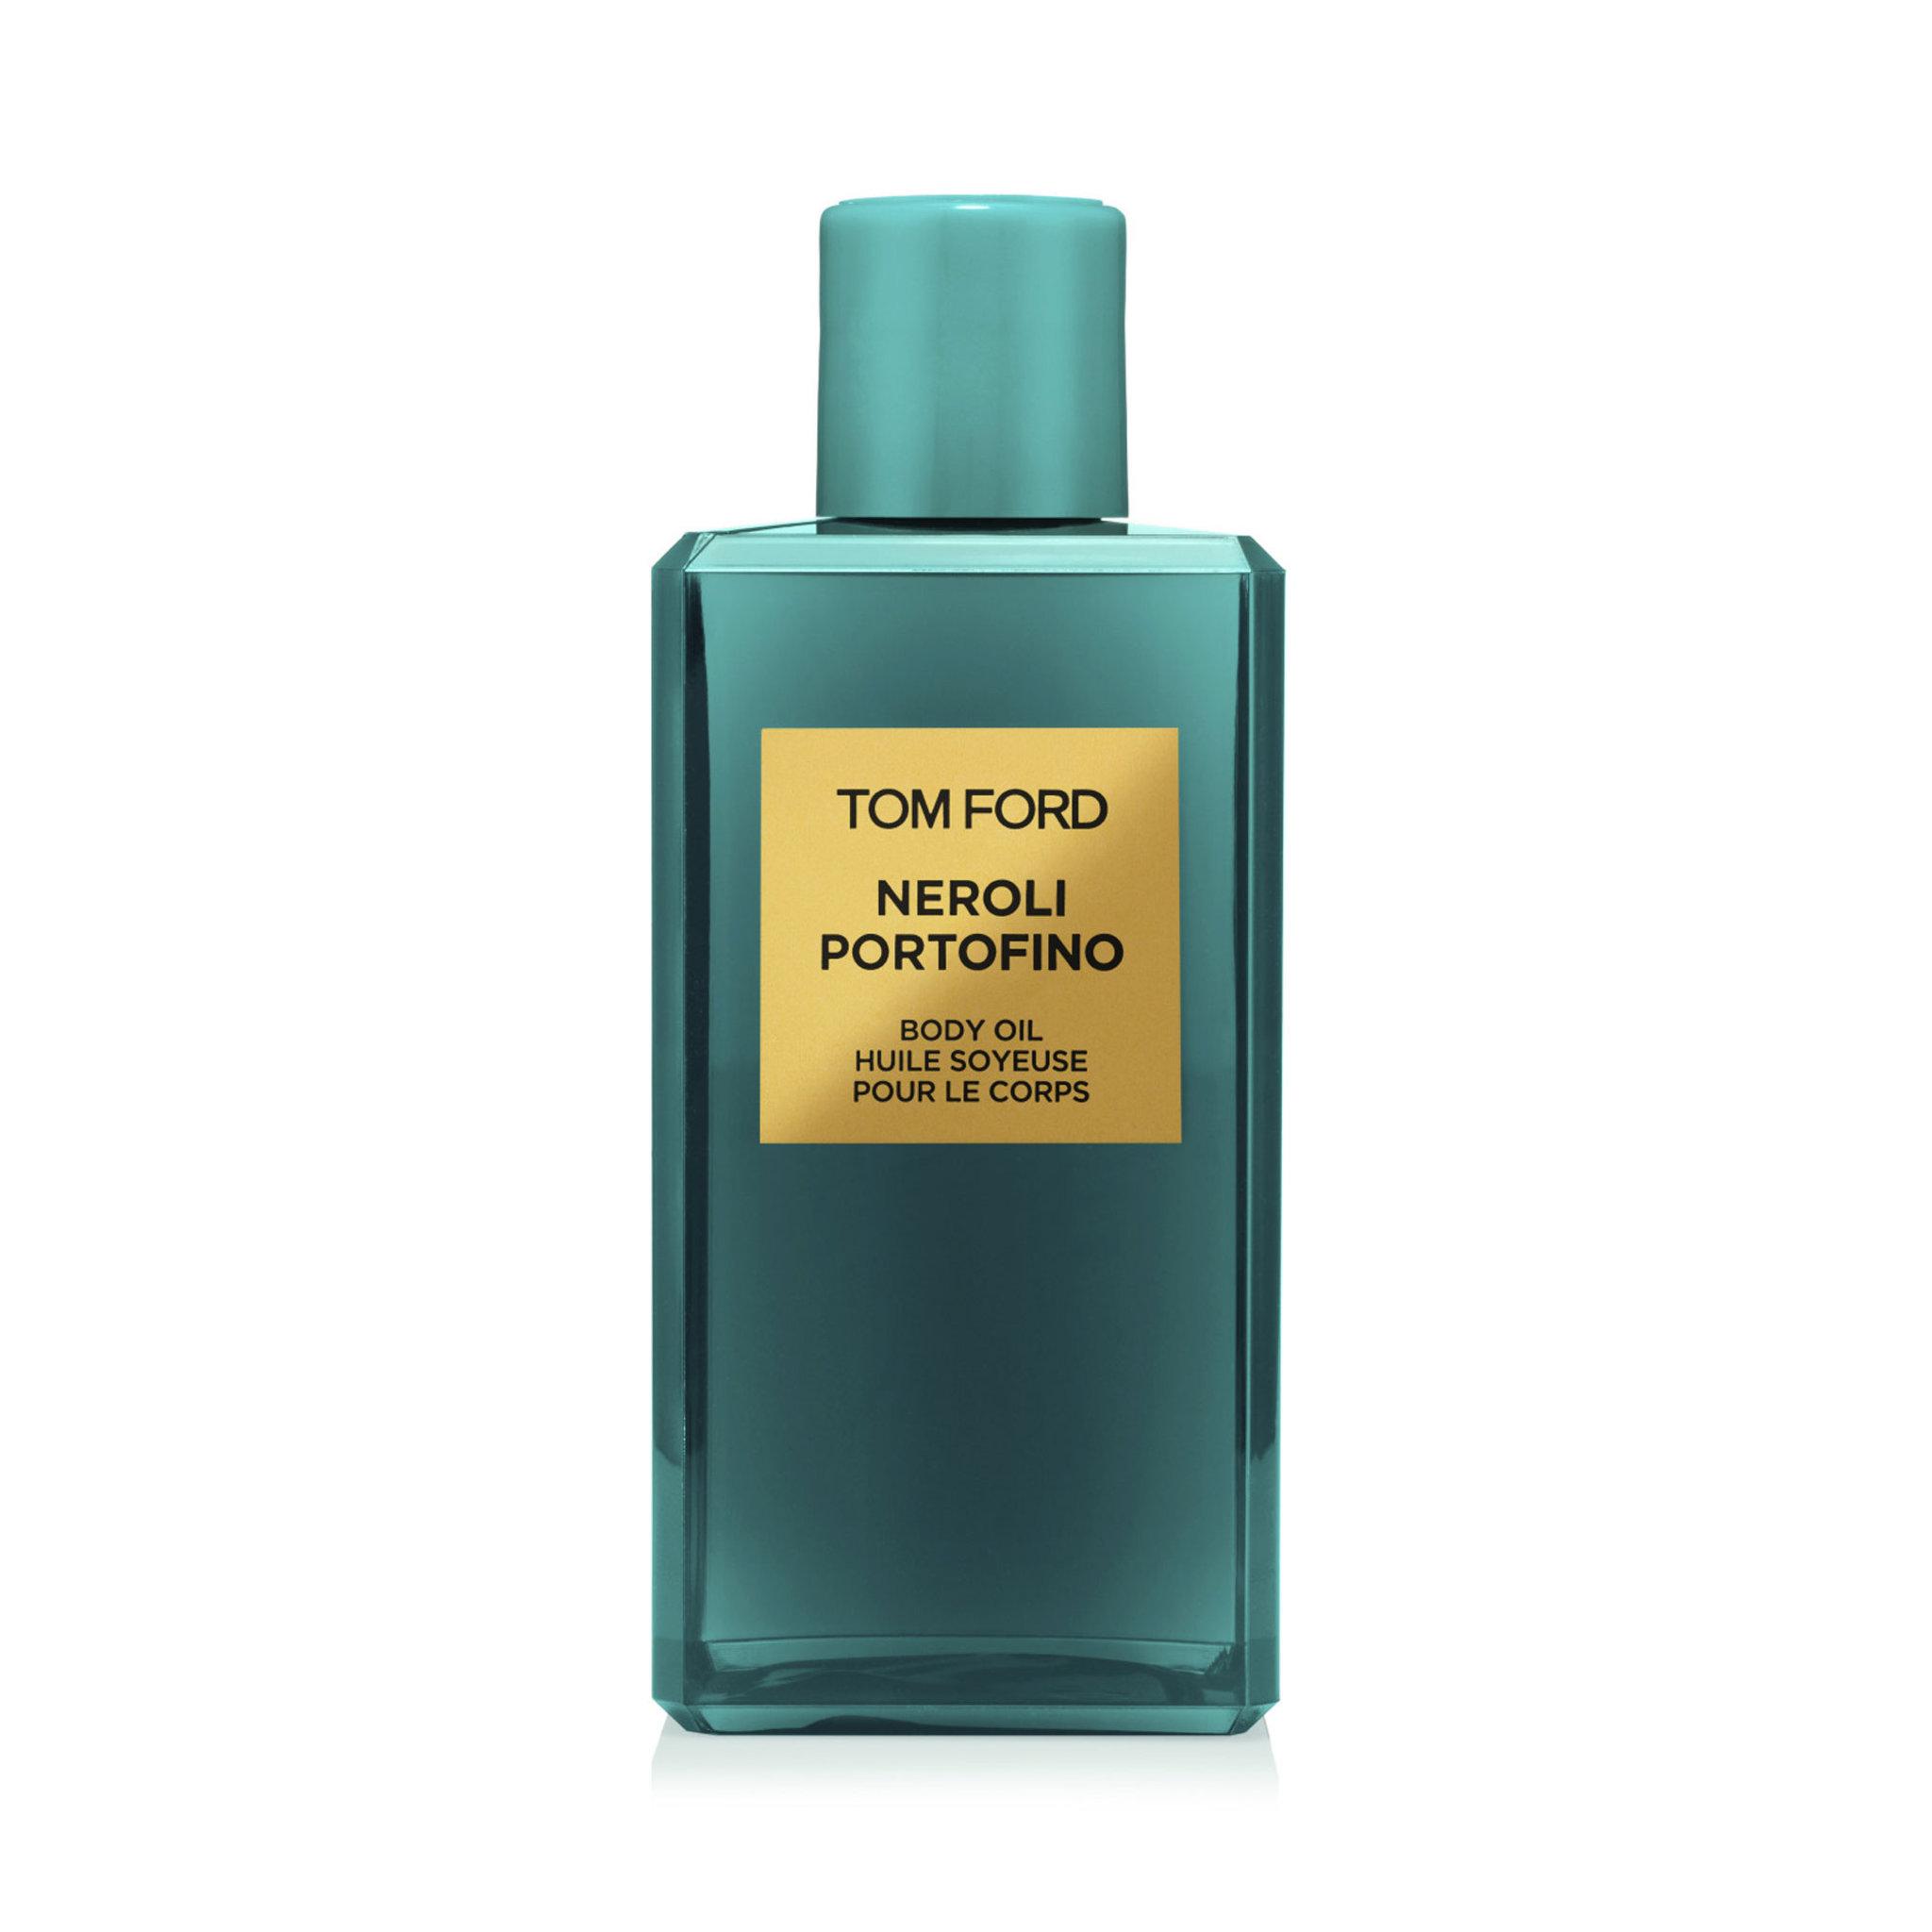 Neroli Portofino Body Oil, 250 ML